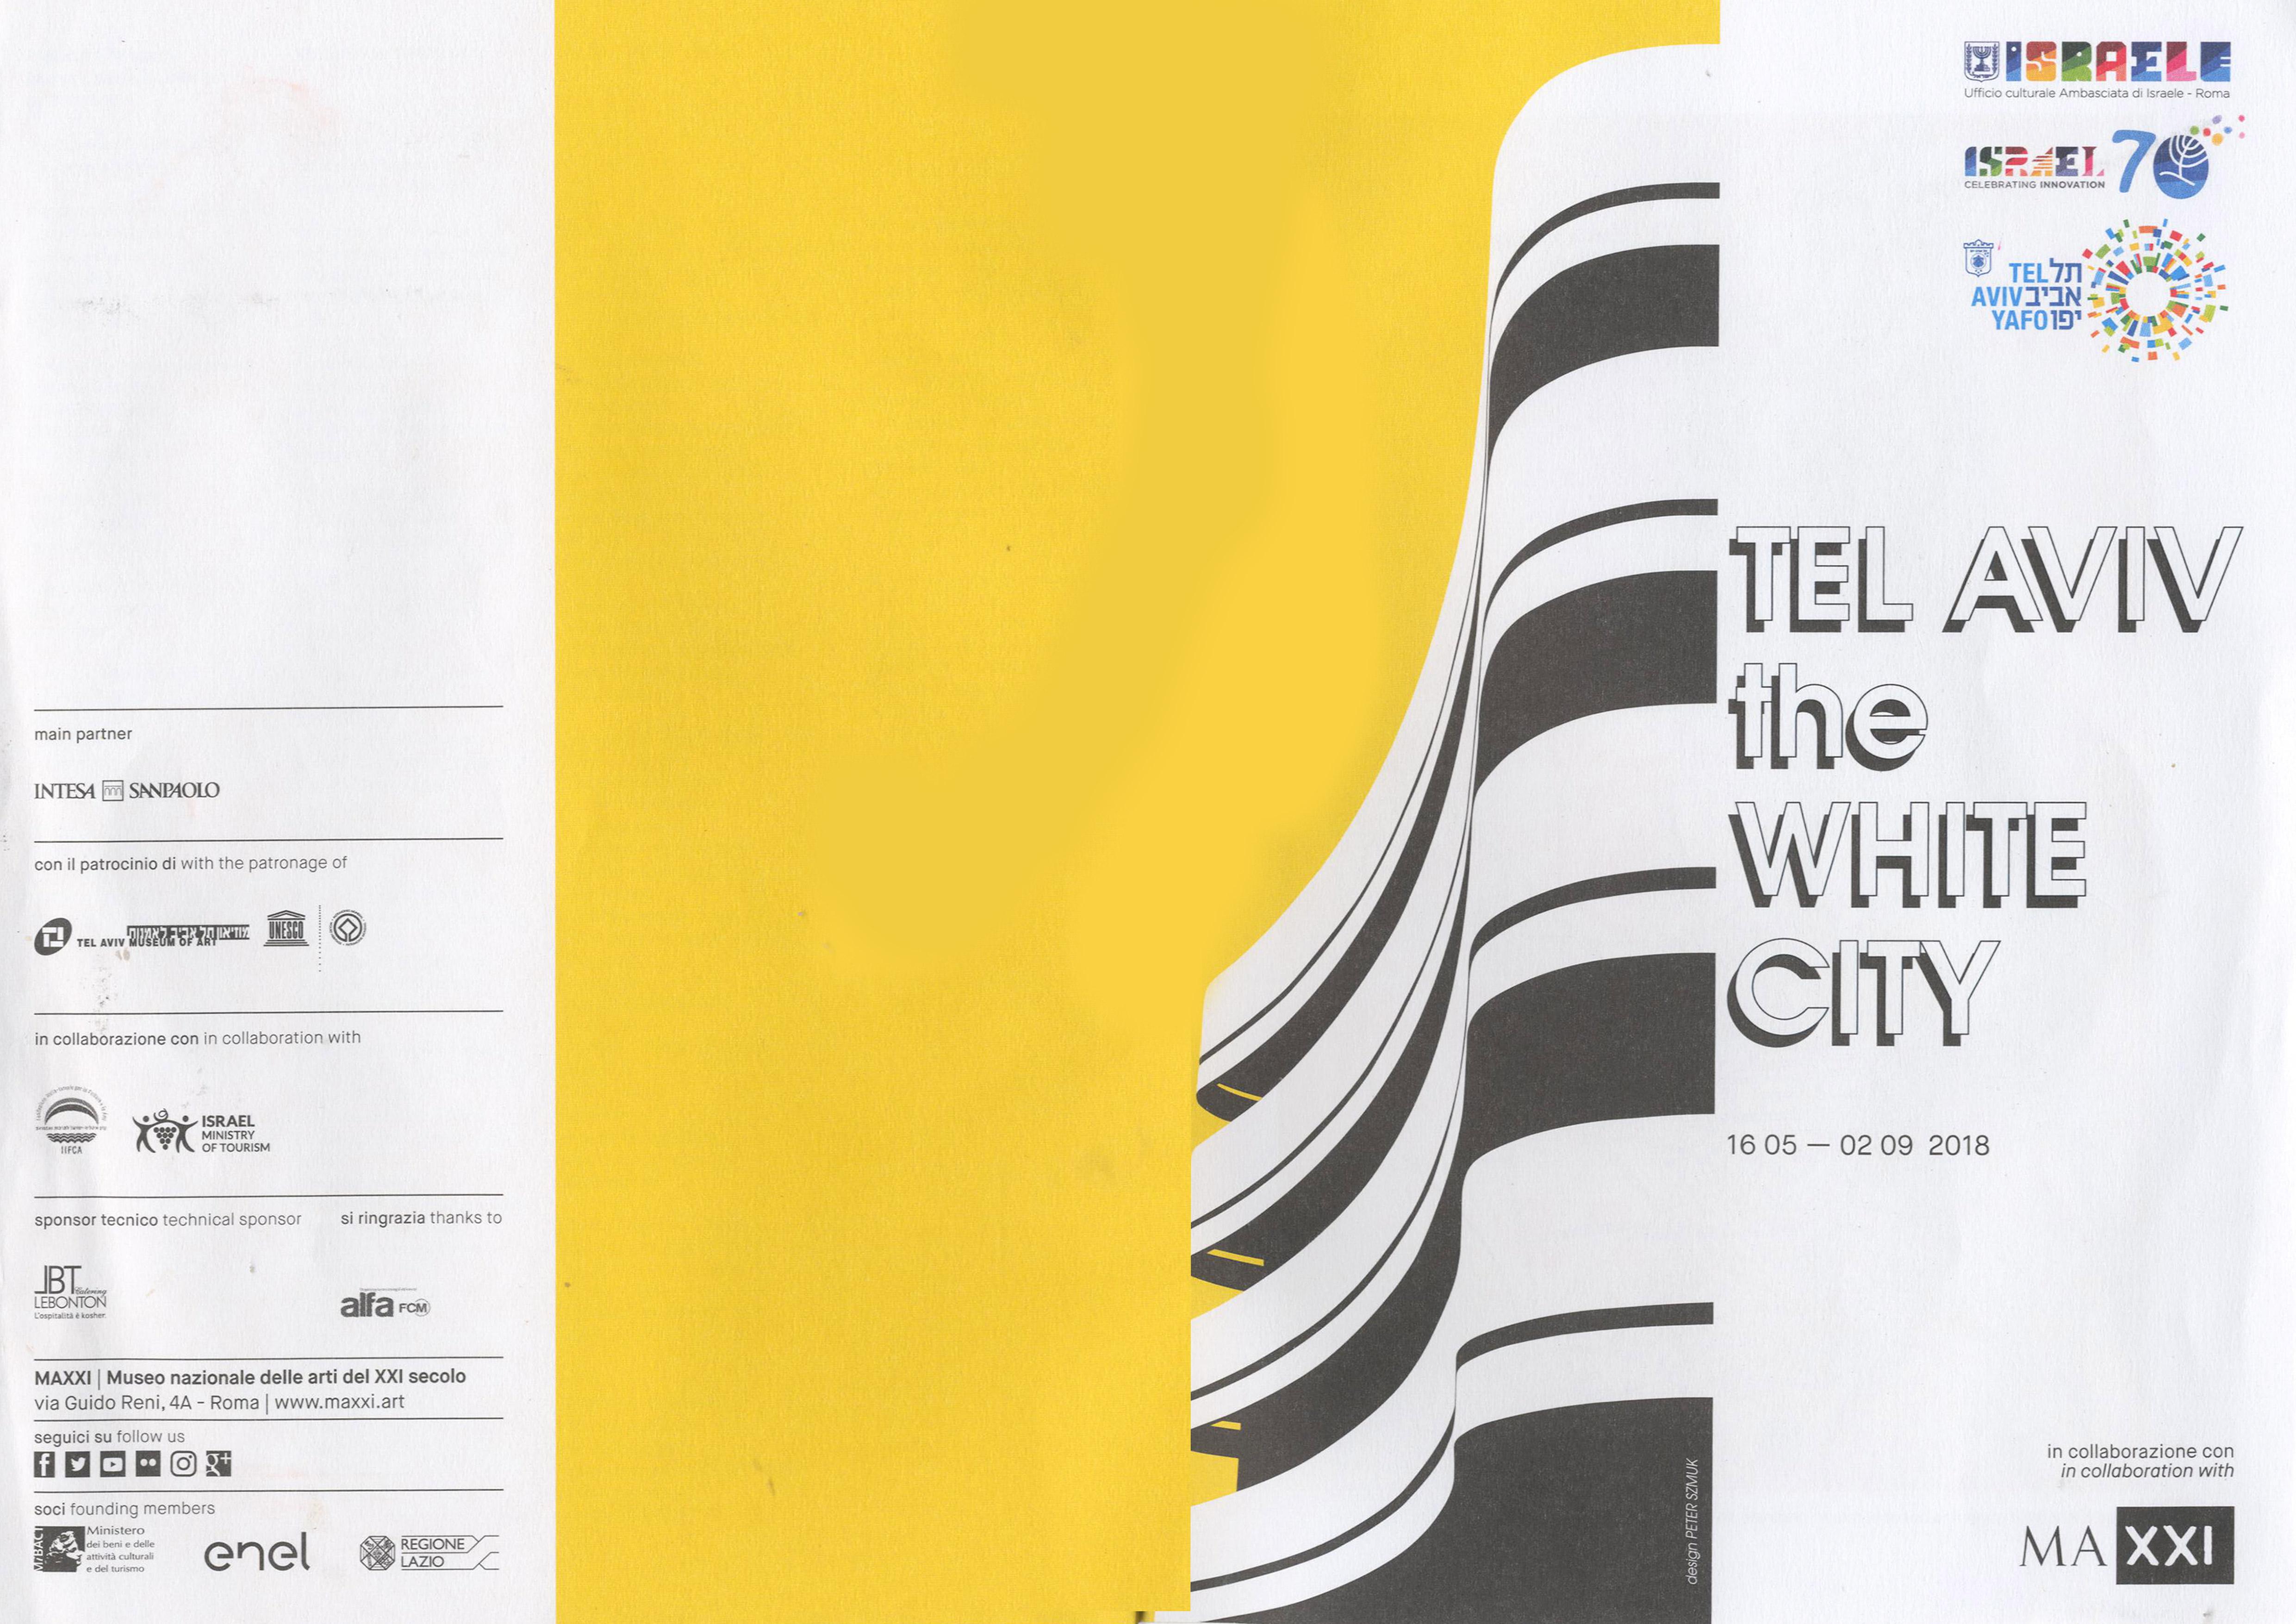 Tel -Aviv White city/ Maxxi museum/ Rome